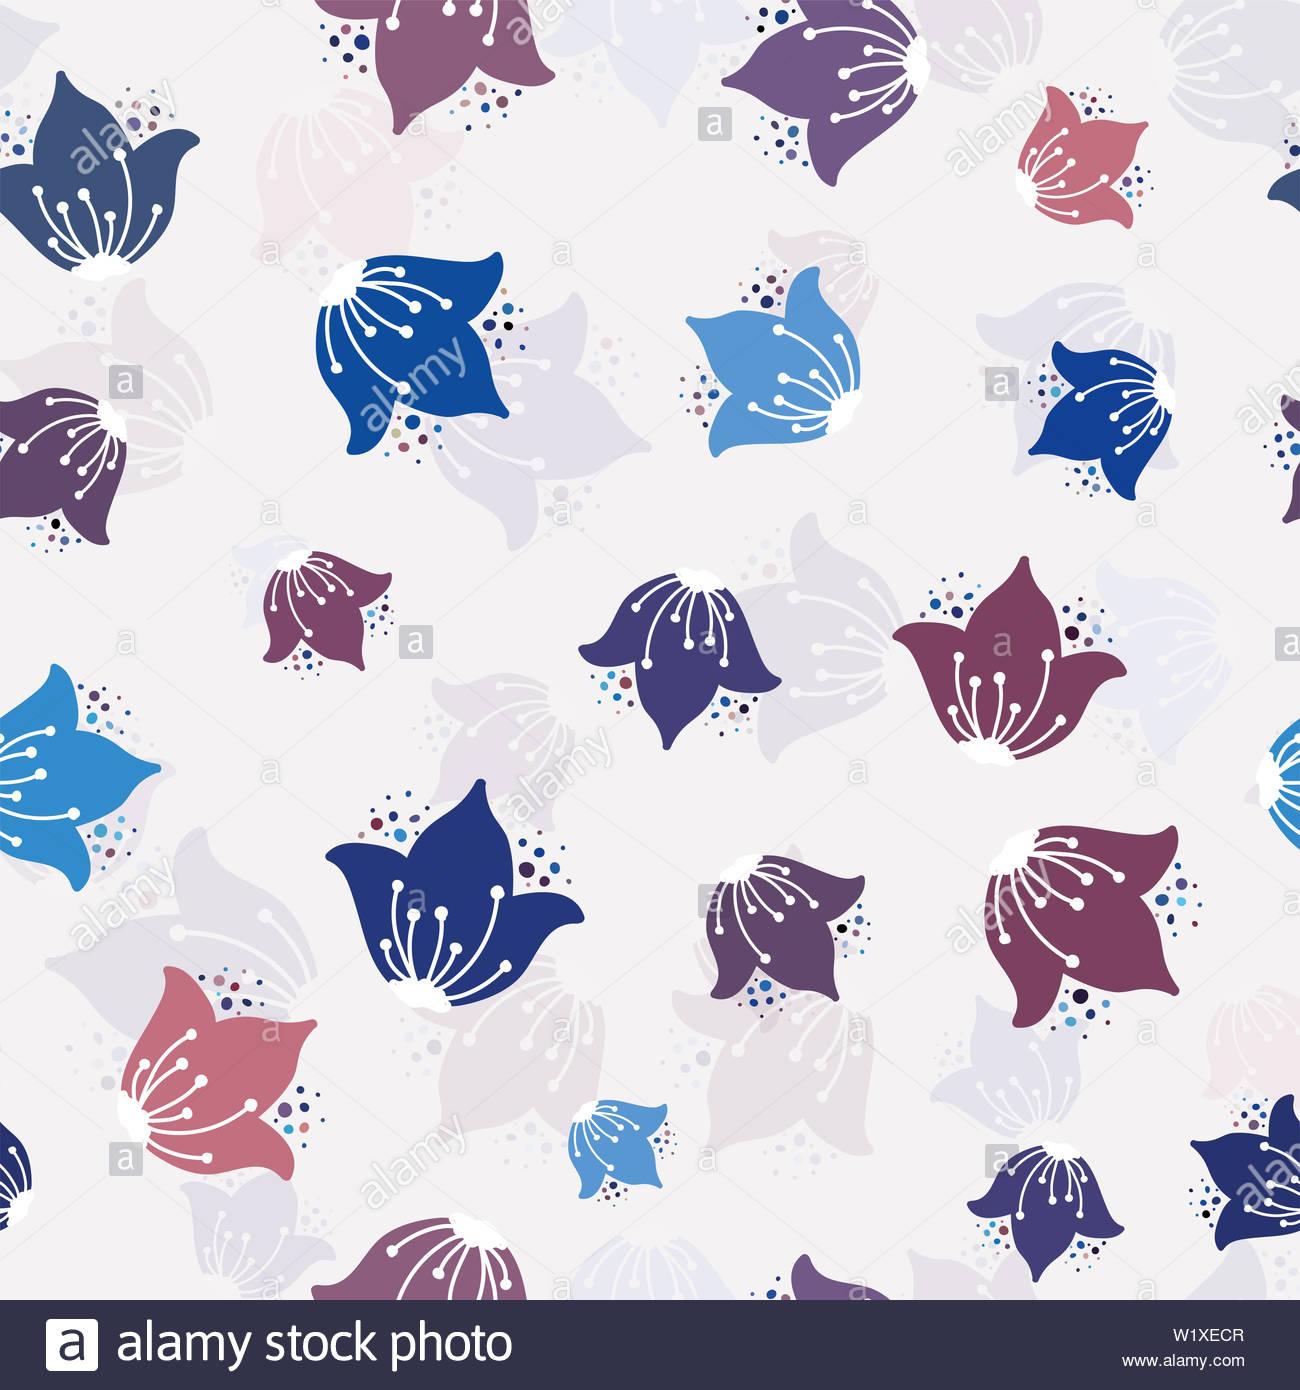 Childish Burgundy Blue Flowers Seamless Pattern Background